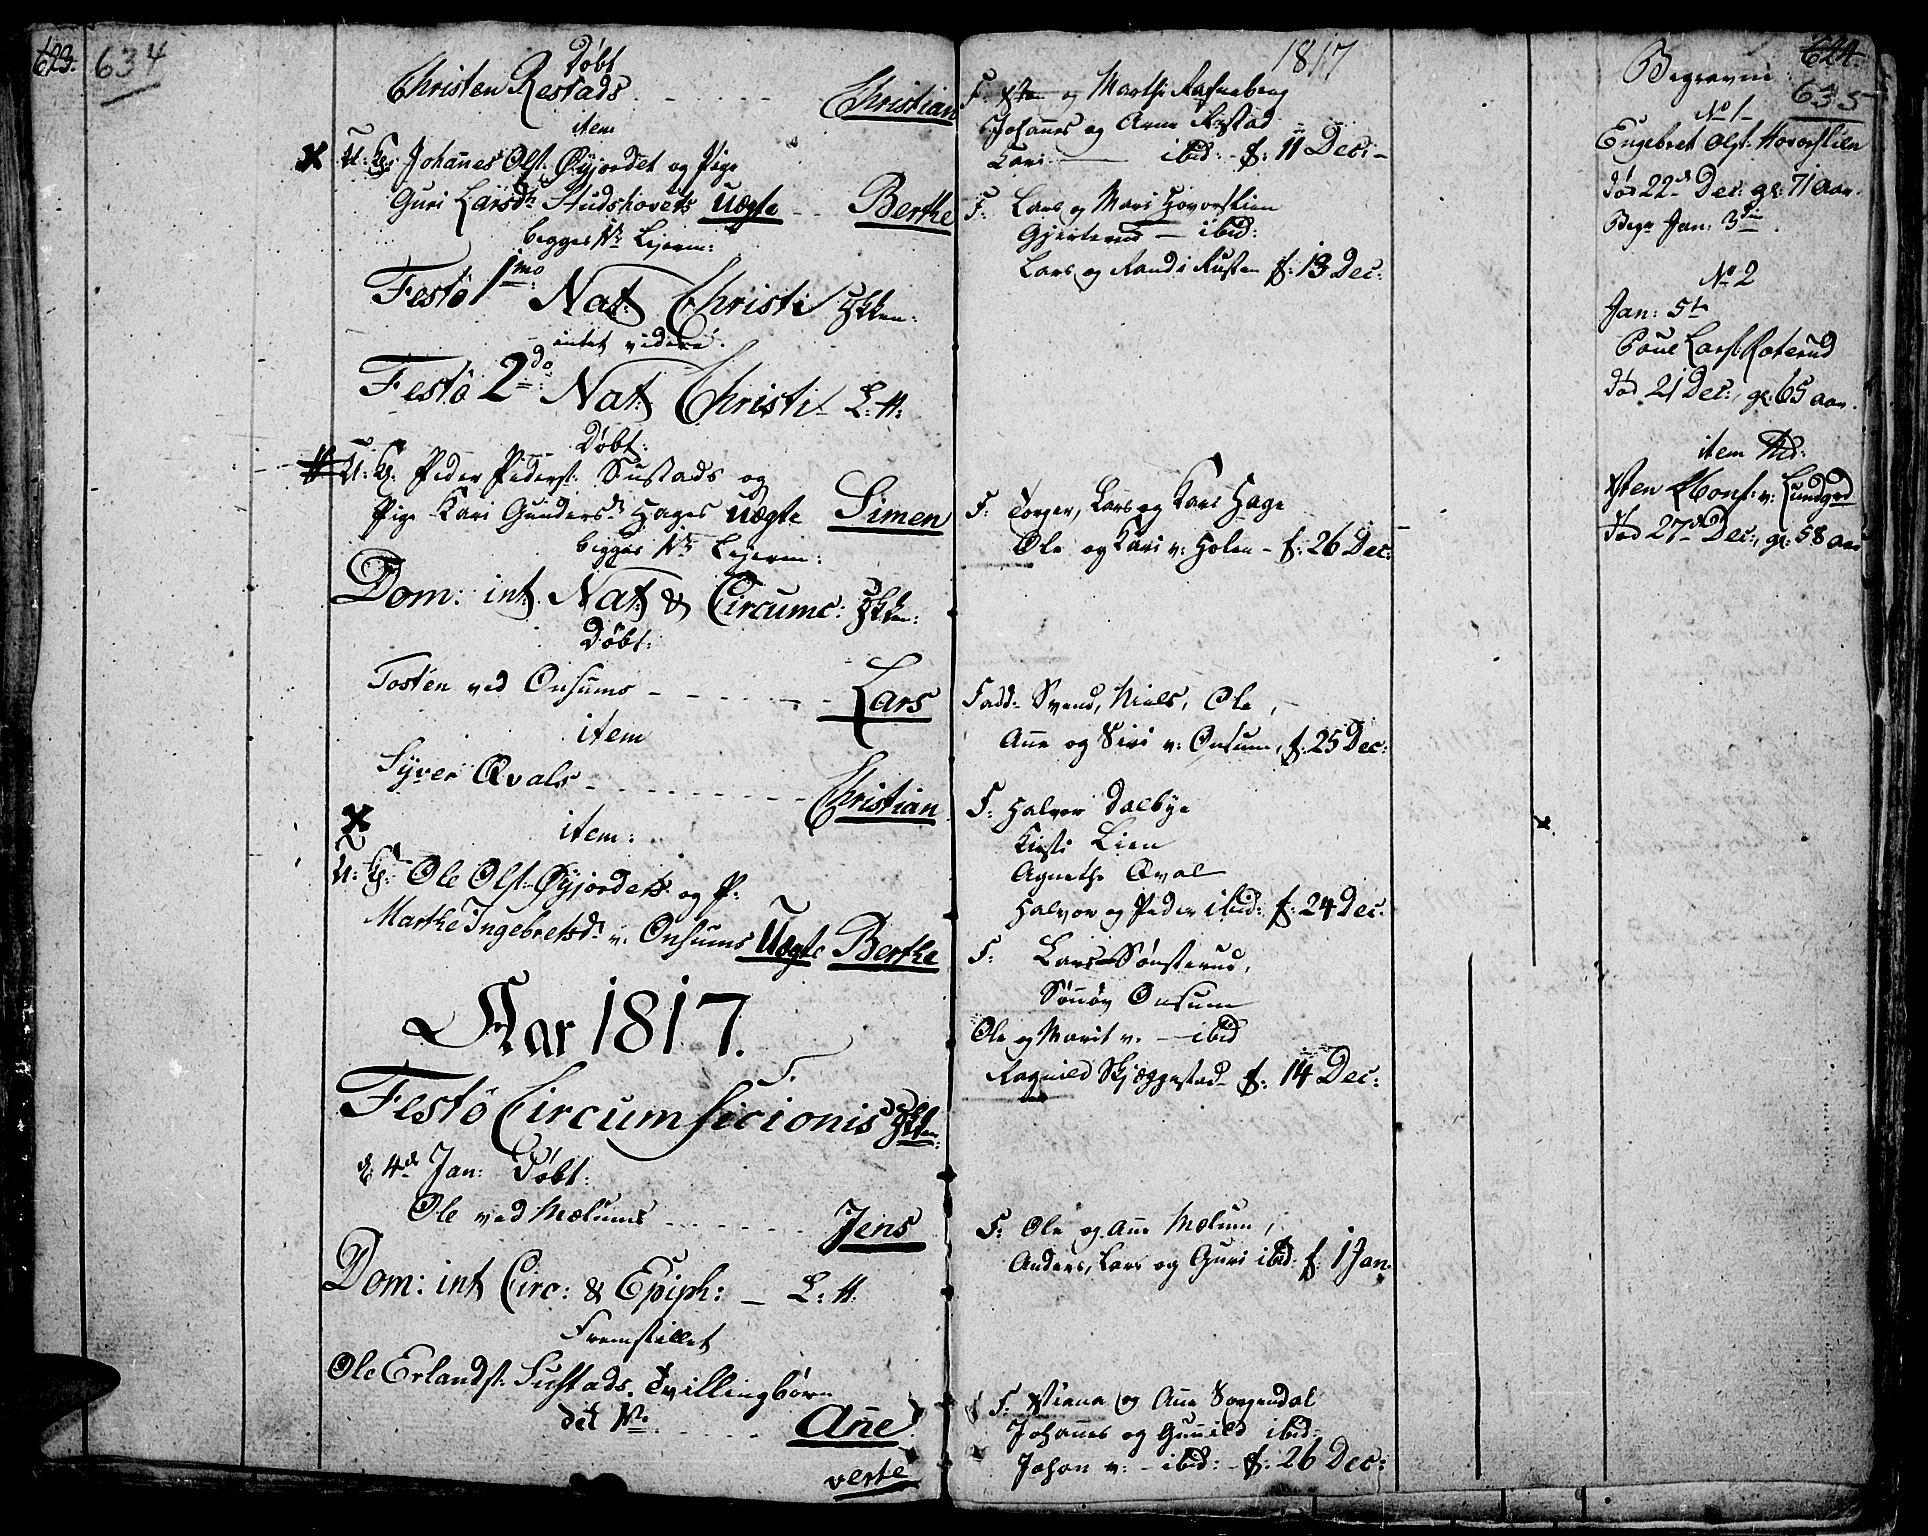 SAH, Fåberg prestekontor, Ministerialbok nr. 2, 1775-1818, s. 634-635